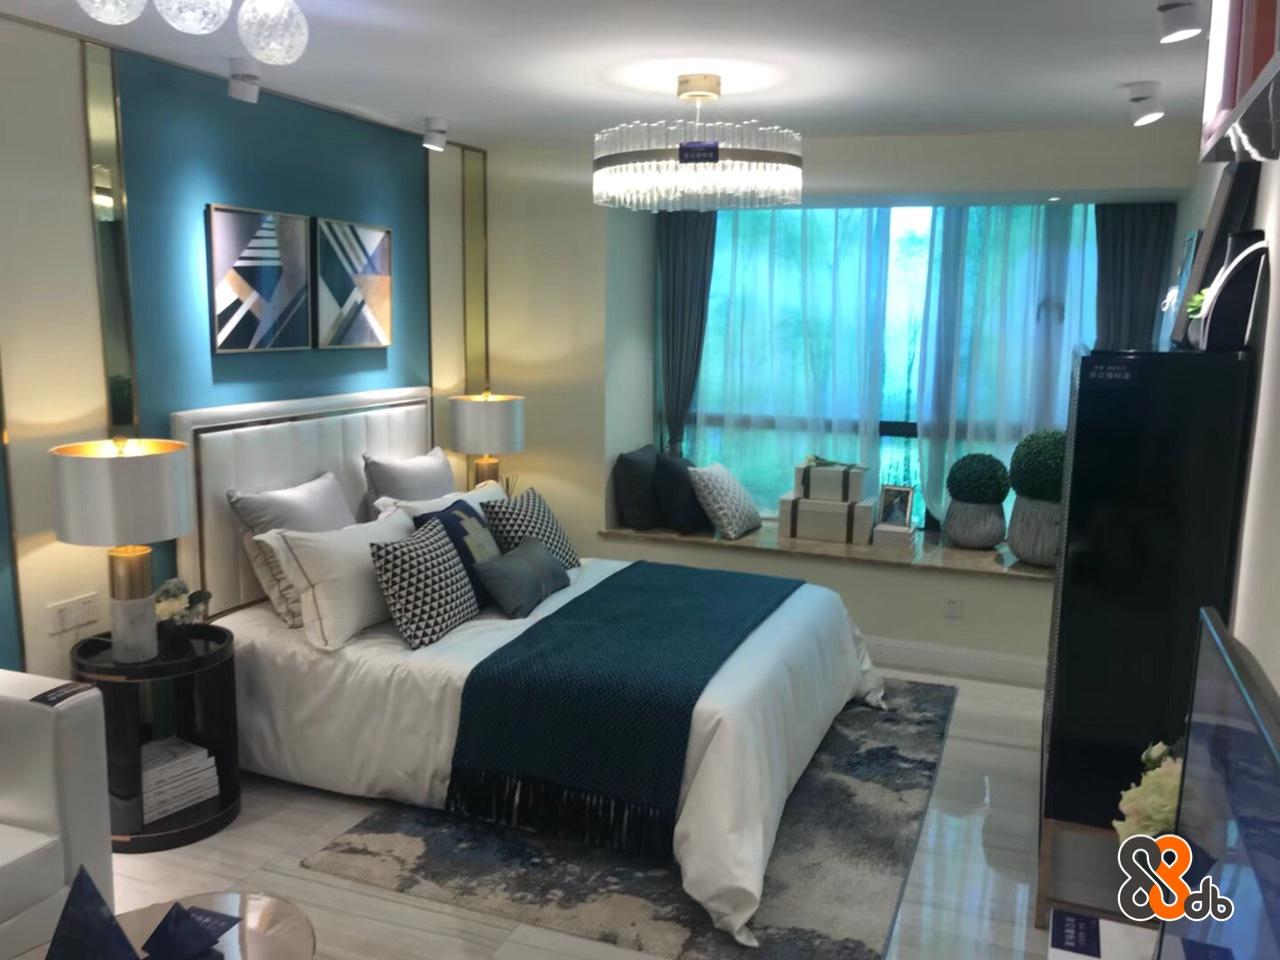 room,property,interior design,ceiling,bedroom